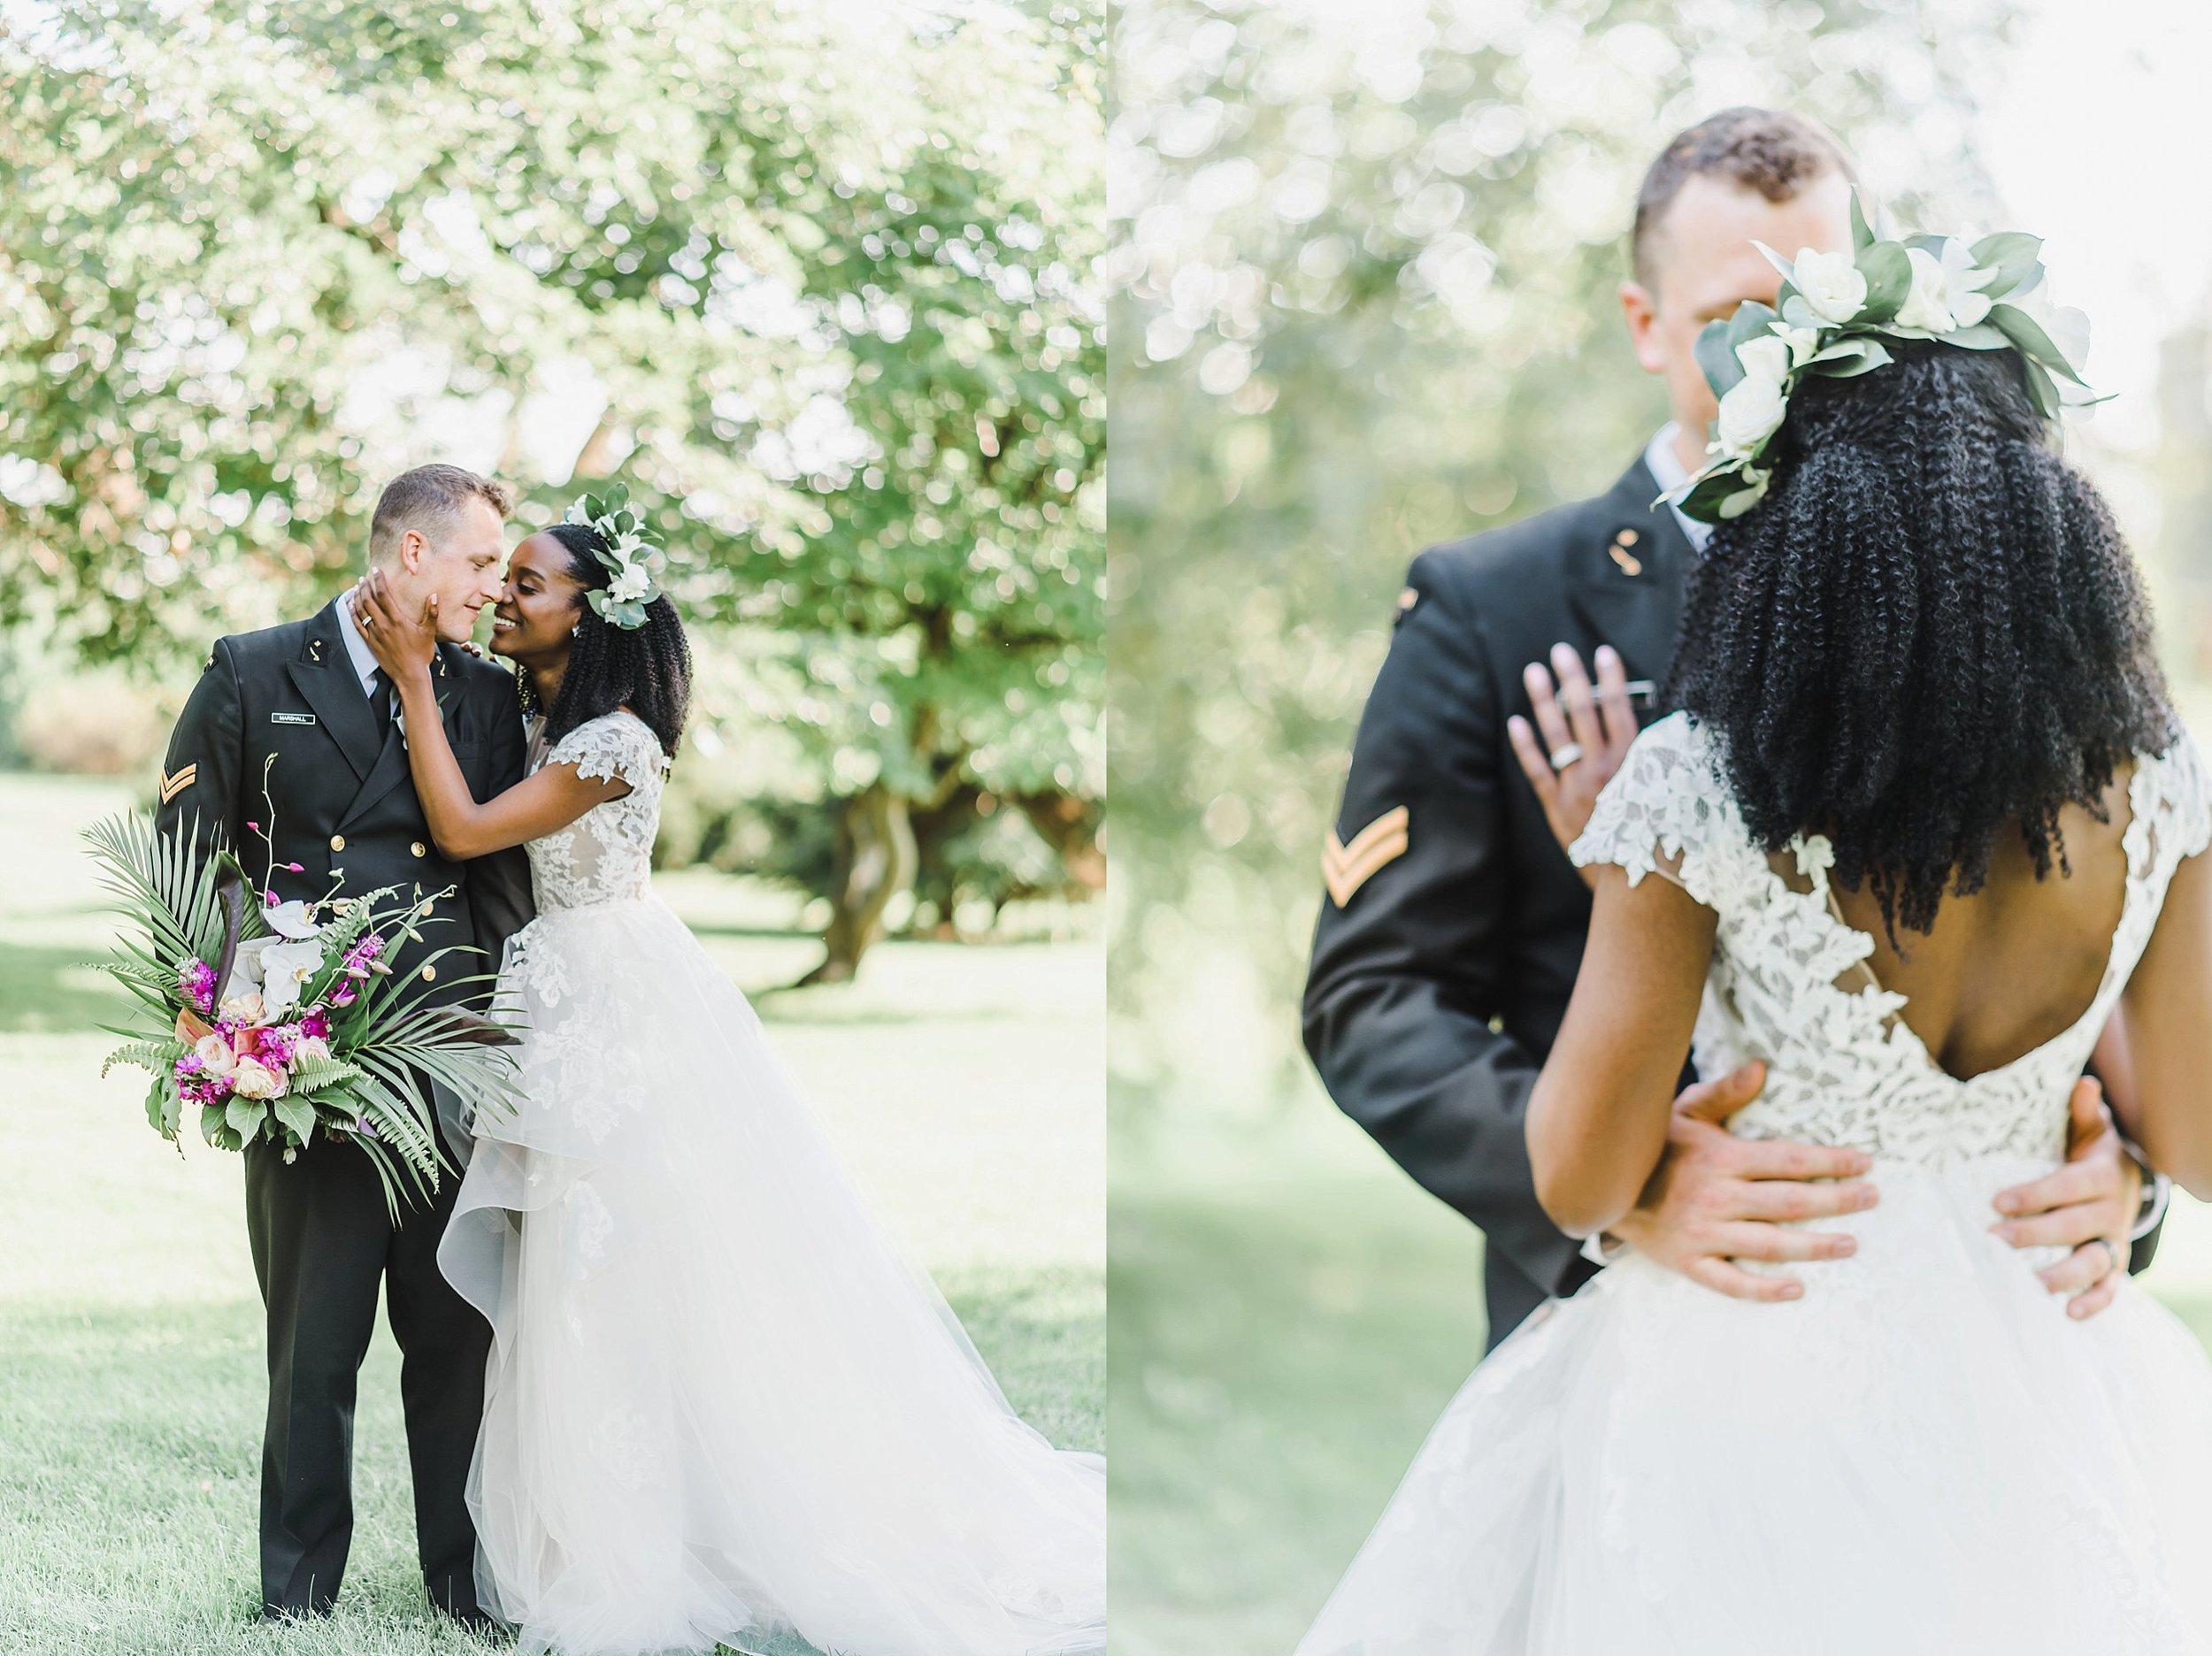 light airy indie fine art ottawa wedding photographer | Ali and Batoul Photography_1001.jpg